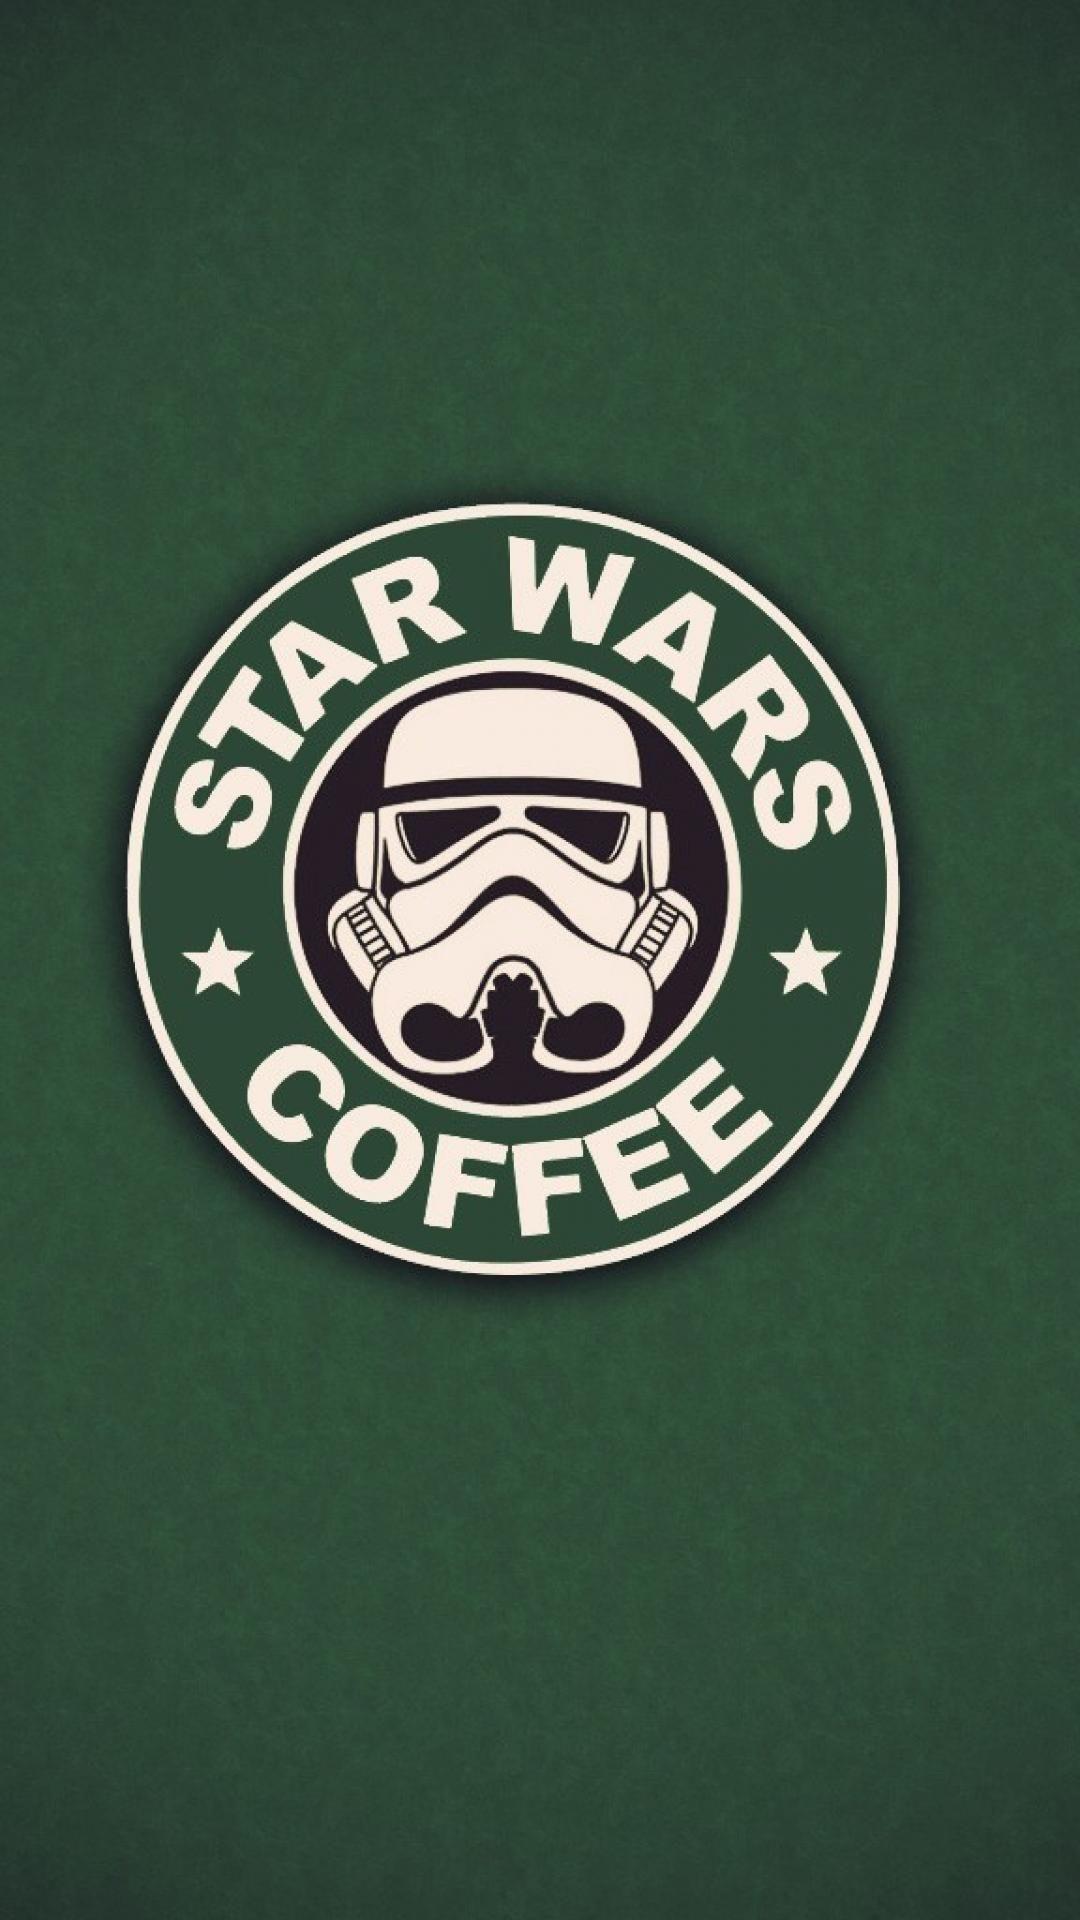 Papel de parede para celular de Star Wars Papel de